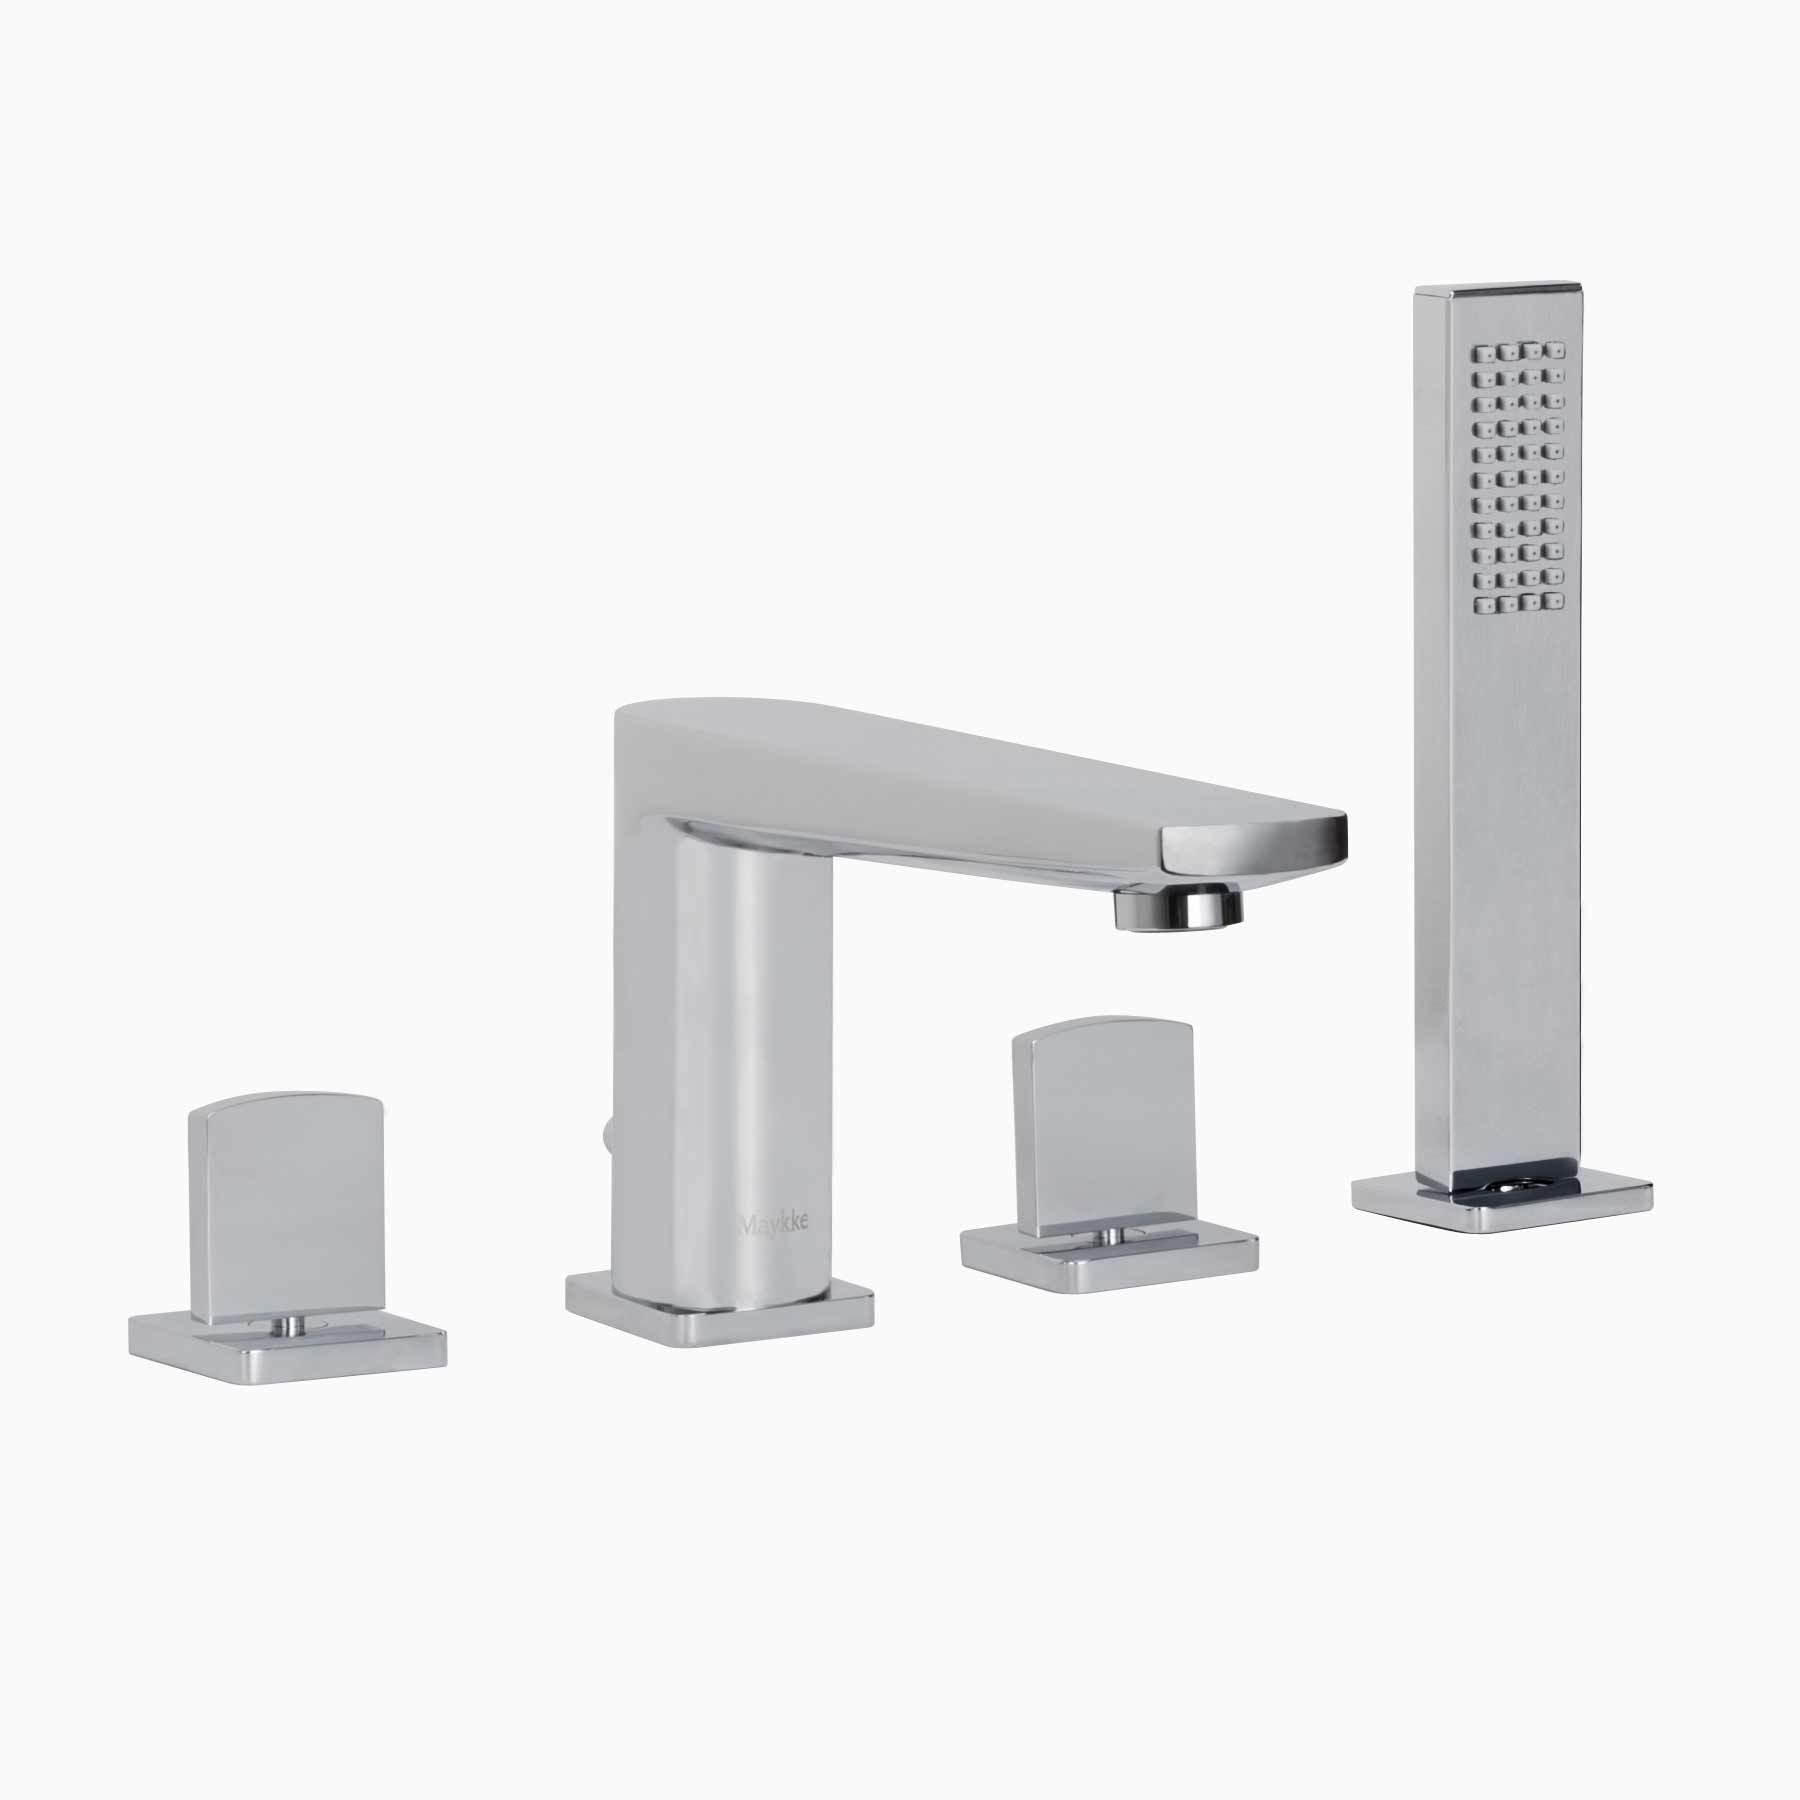 Adalbert Deck Mount Bathtub Faucet With Hand Shower